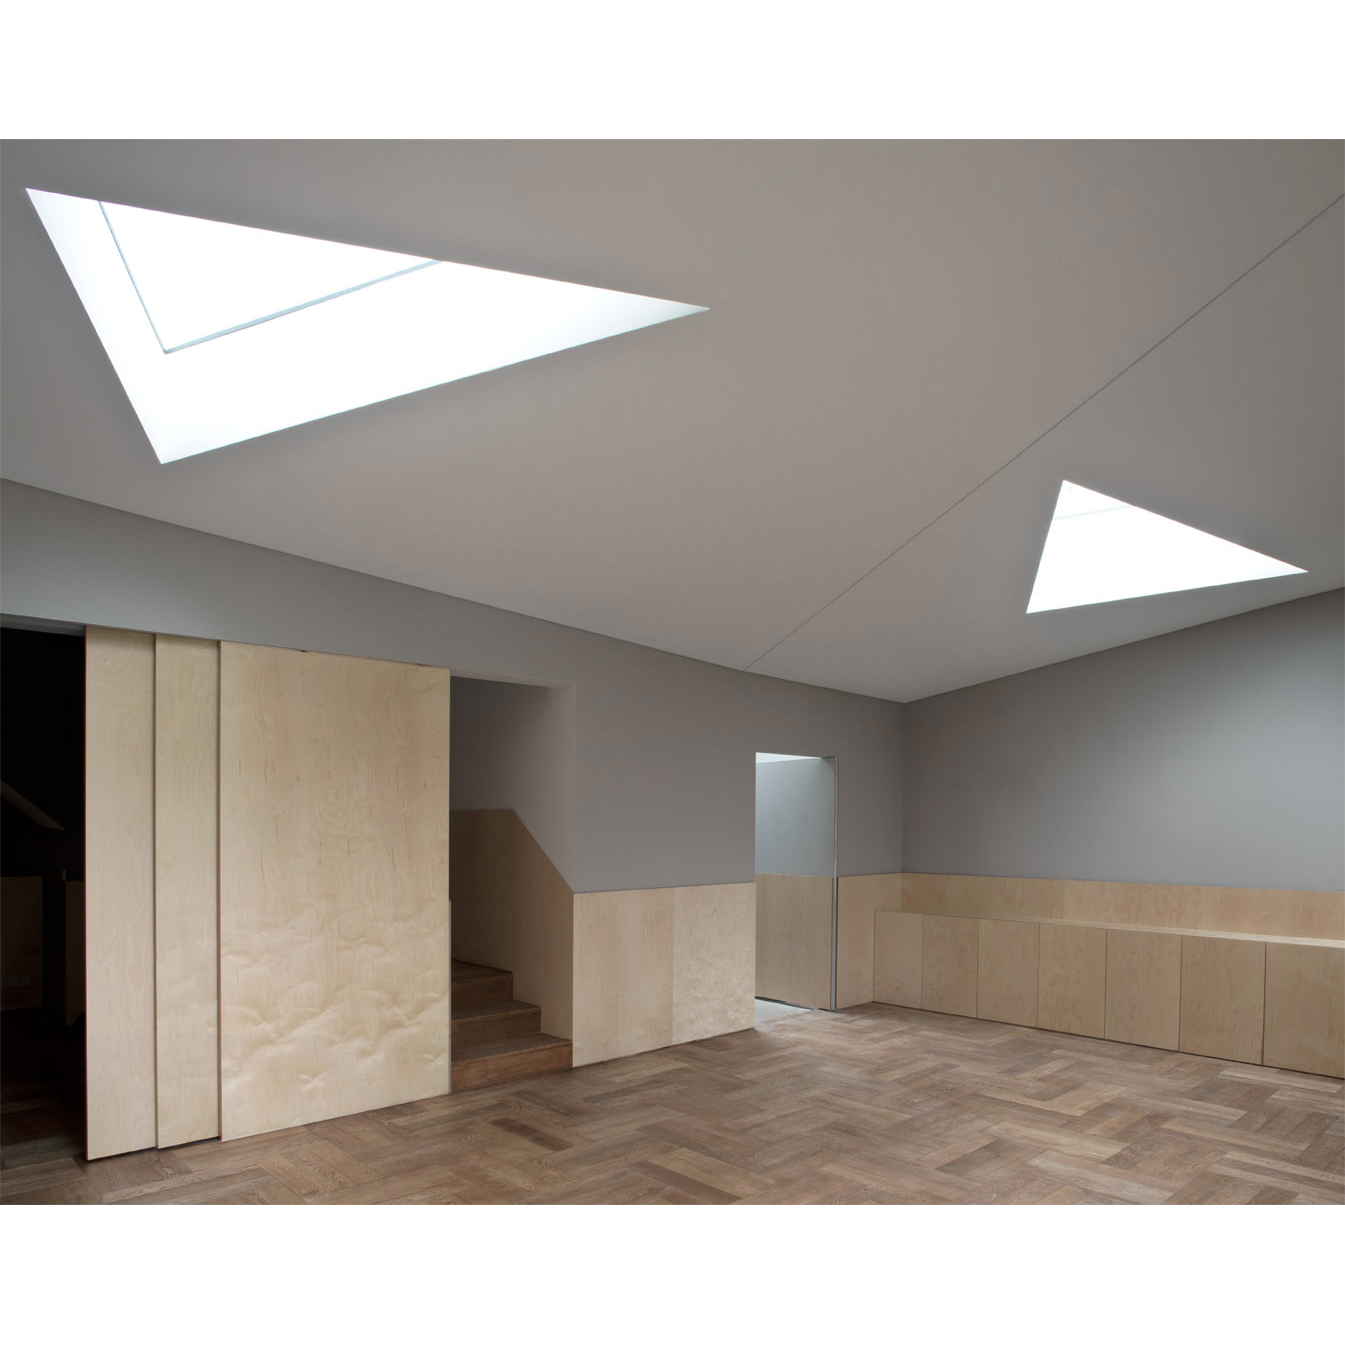 MOCT_house_extension_barnham rd_square.jpg